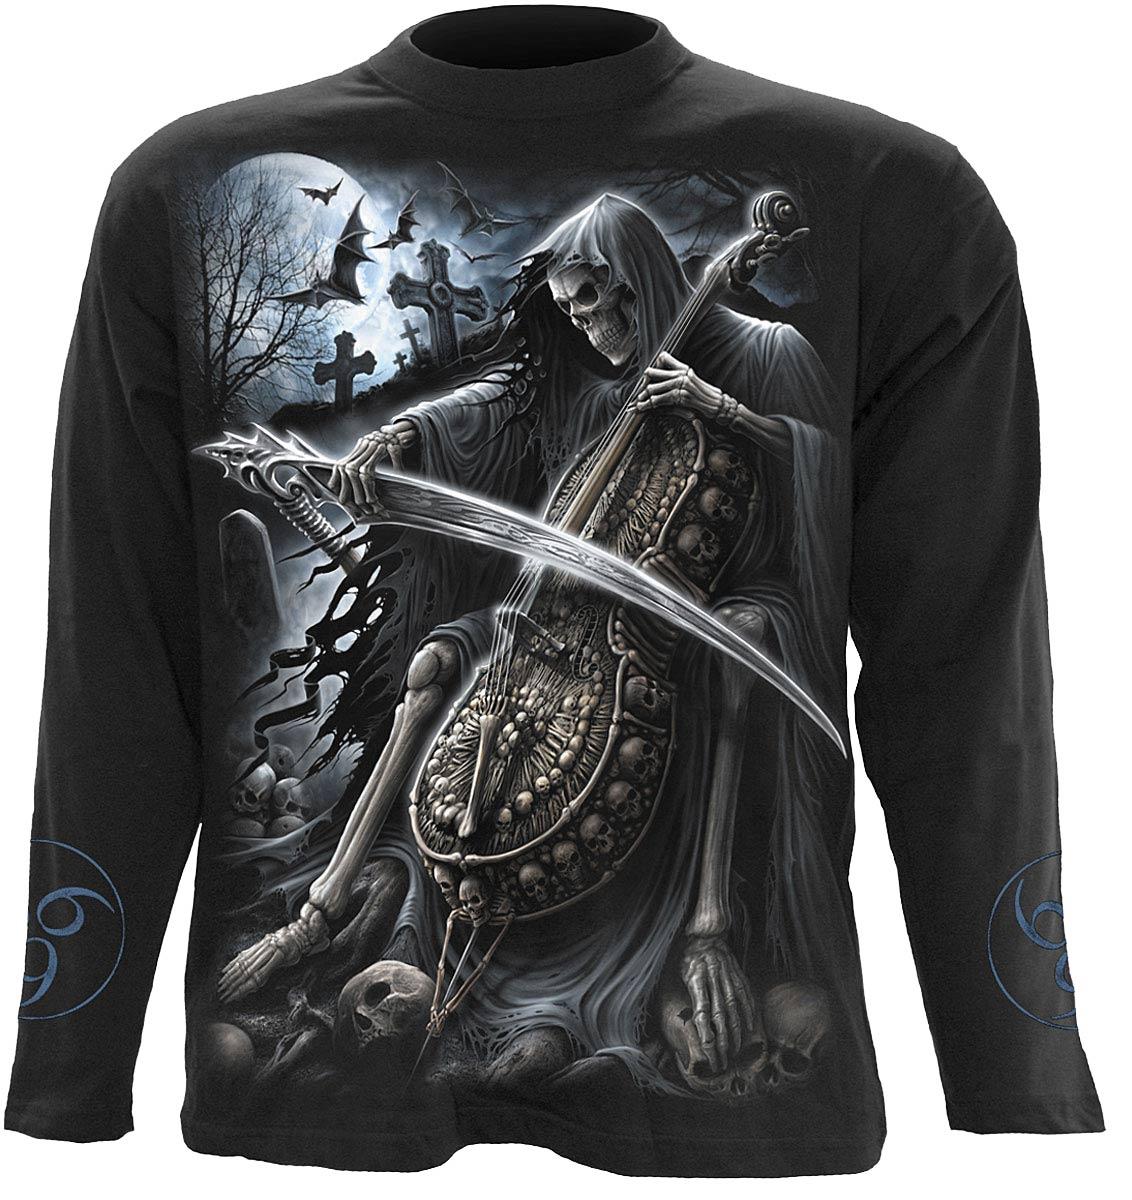 SPIRAL Symphony Of Death Longsleeve T-Shirt Black K013M301